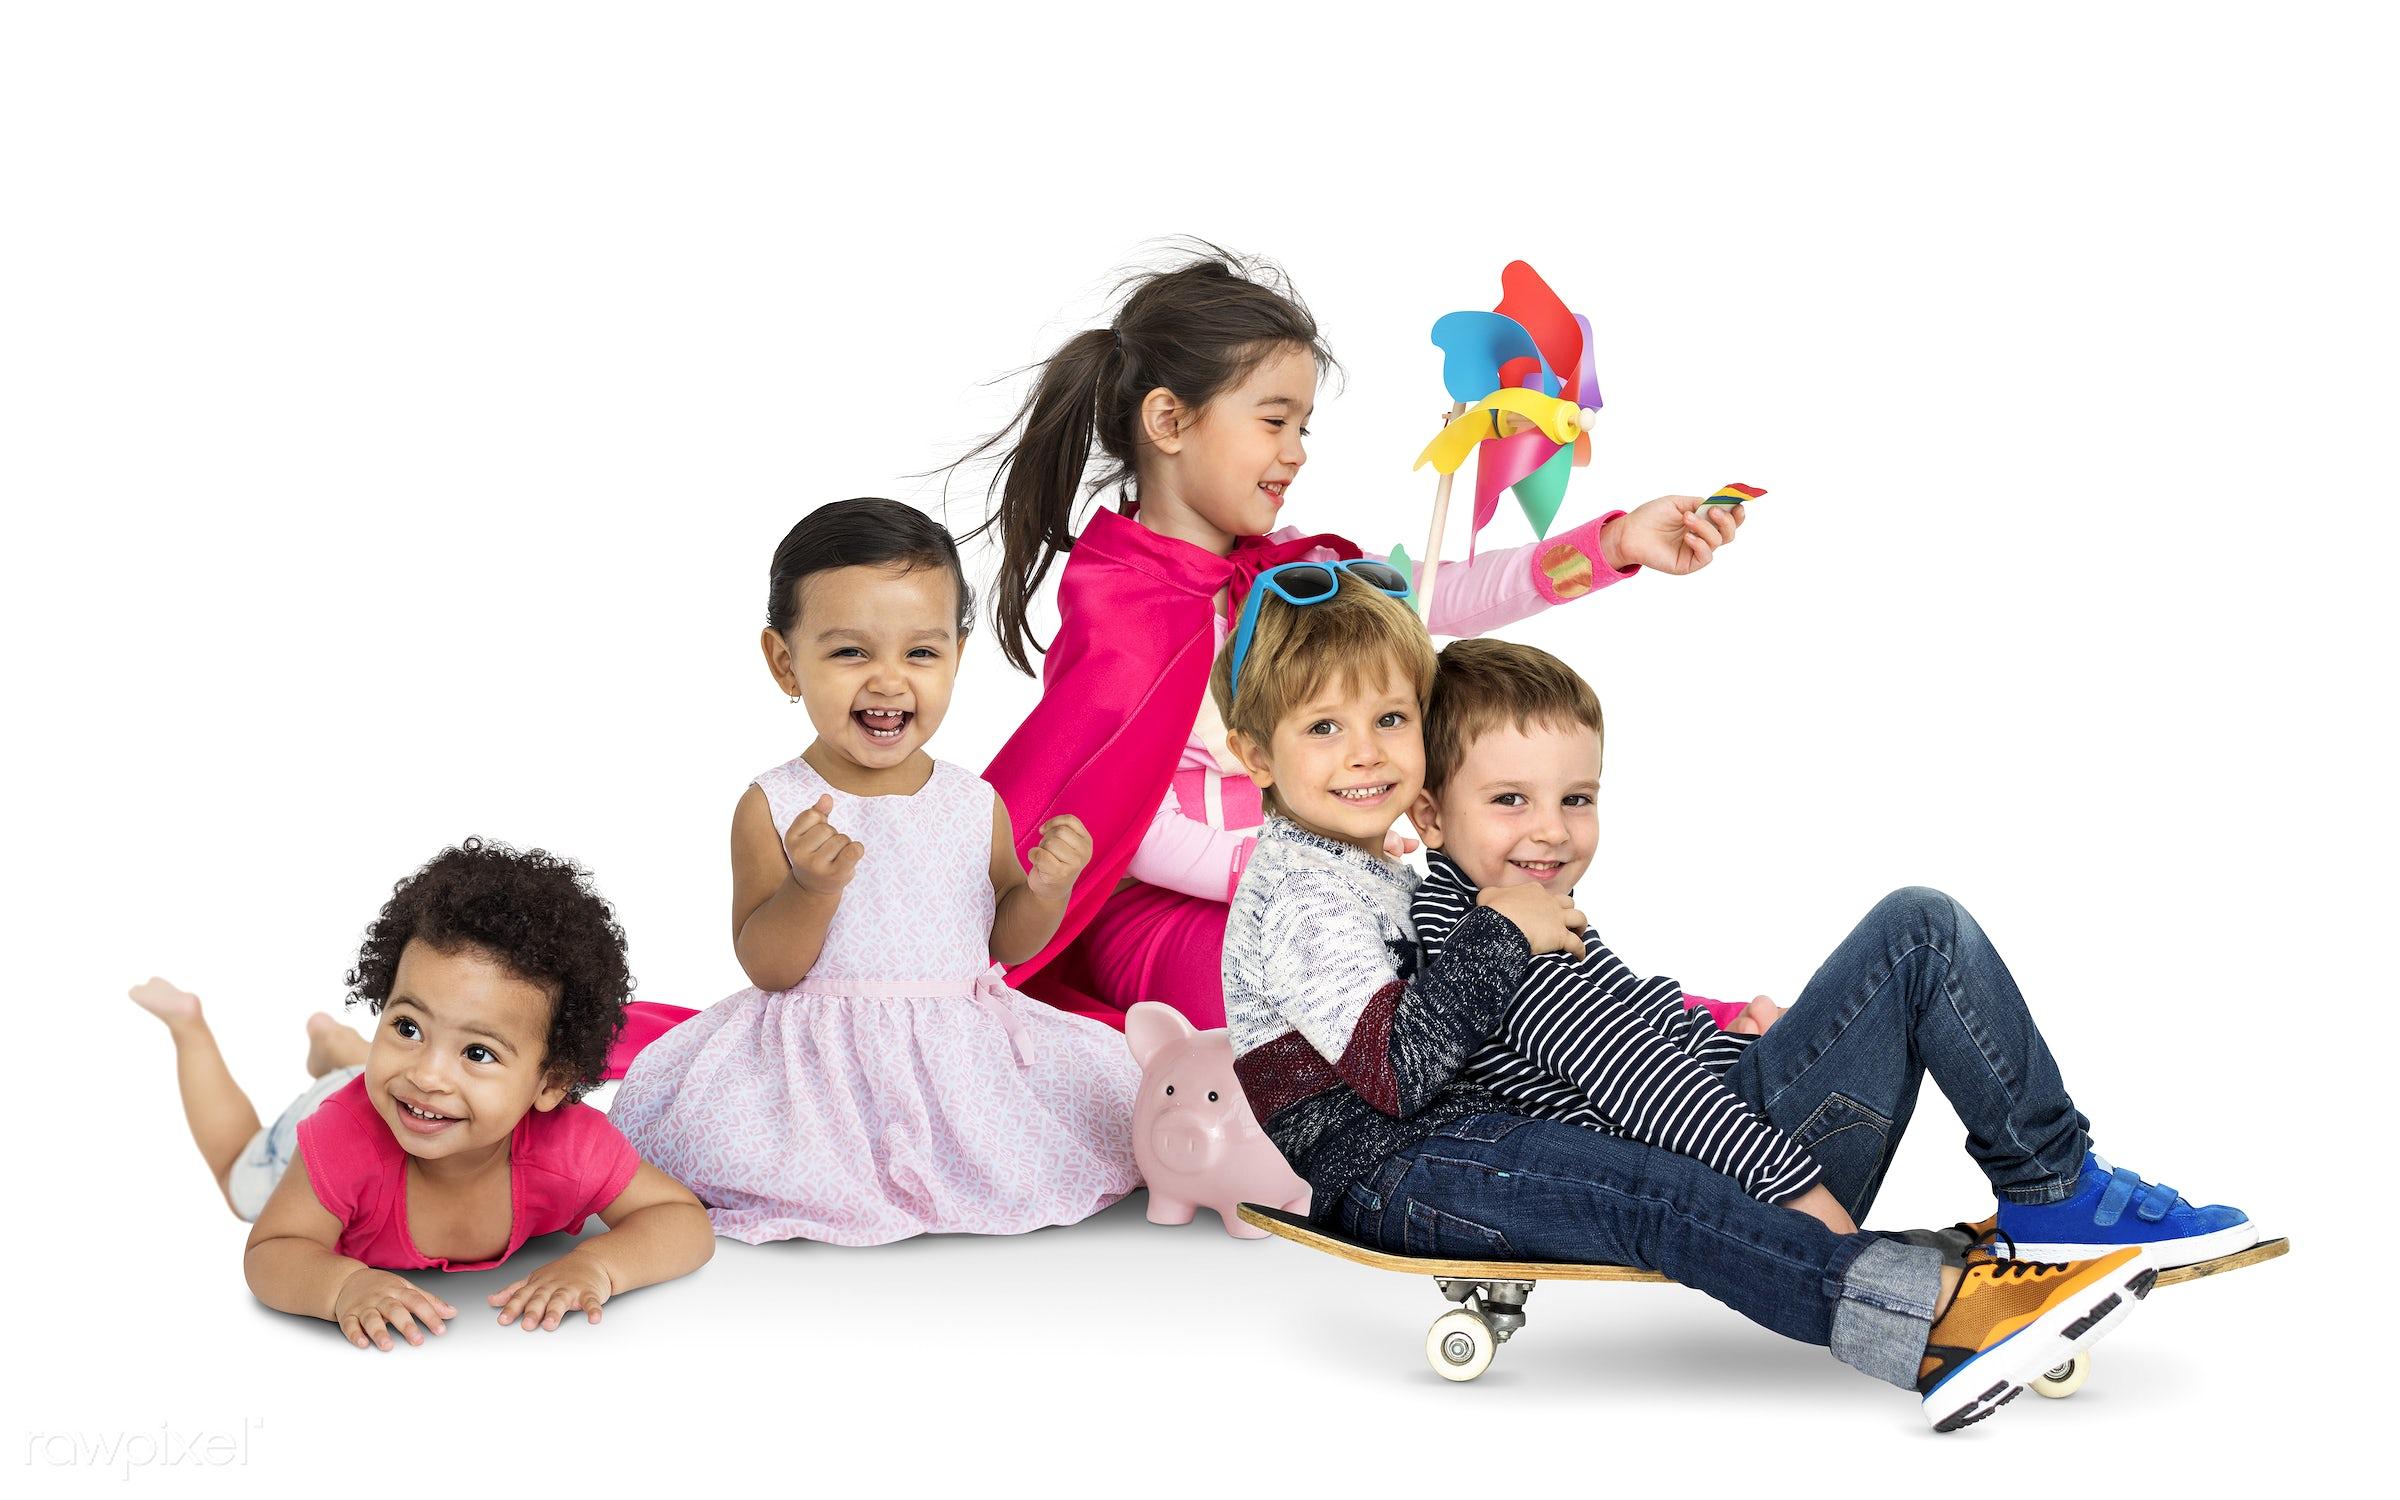 studio, person, diverse, innocent, little, recreation, people, asian, caucasian, little girls, lifestyle, teenager, studio...